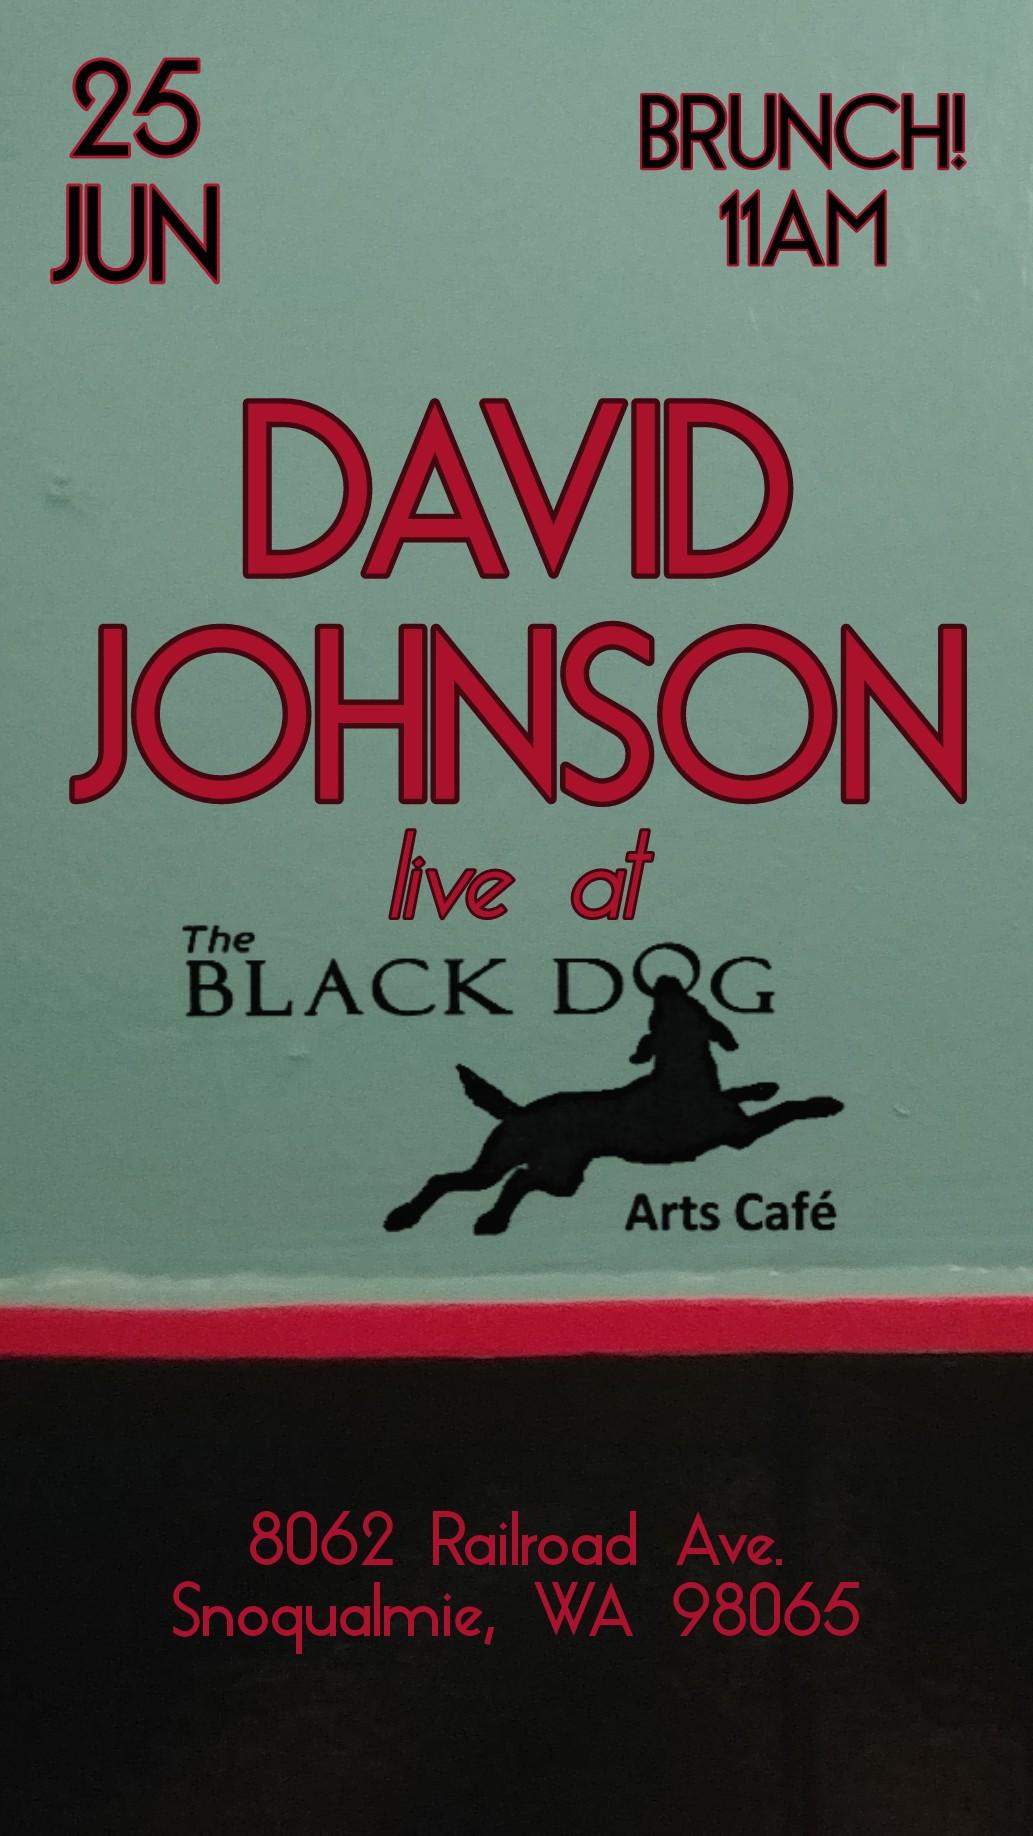 Black Dog 6.25.17